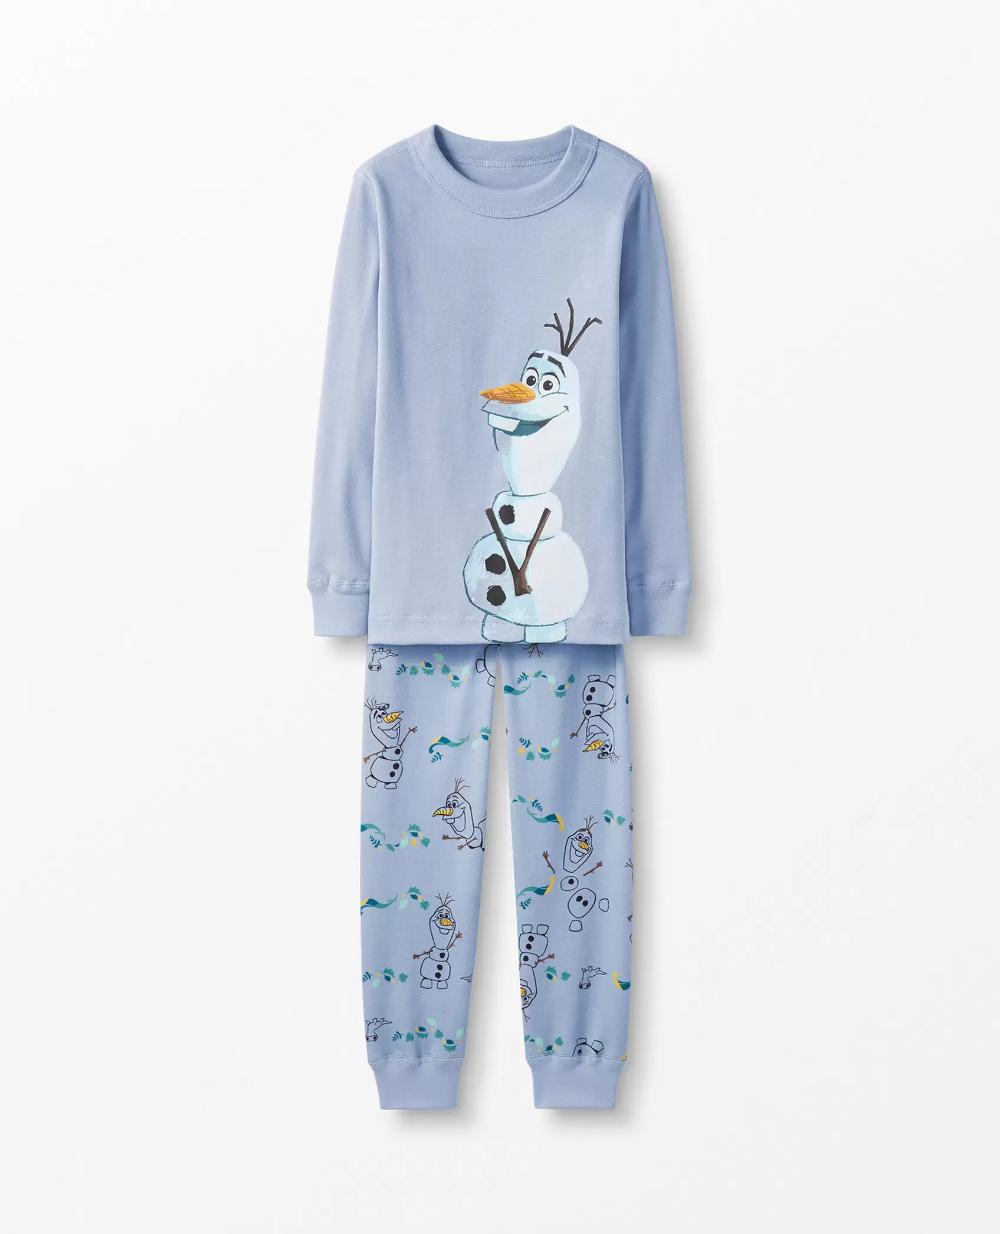 NWT Baby /& Toddler 2-Piece Girl Baby Shark Family Cotton Snug Fit Pajama PJs Set